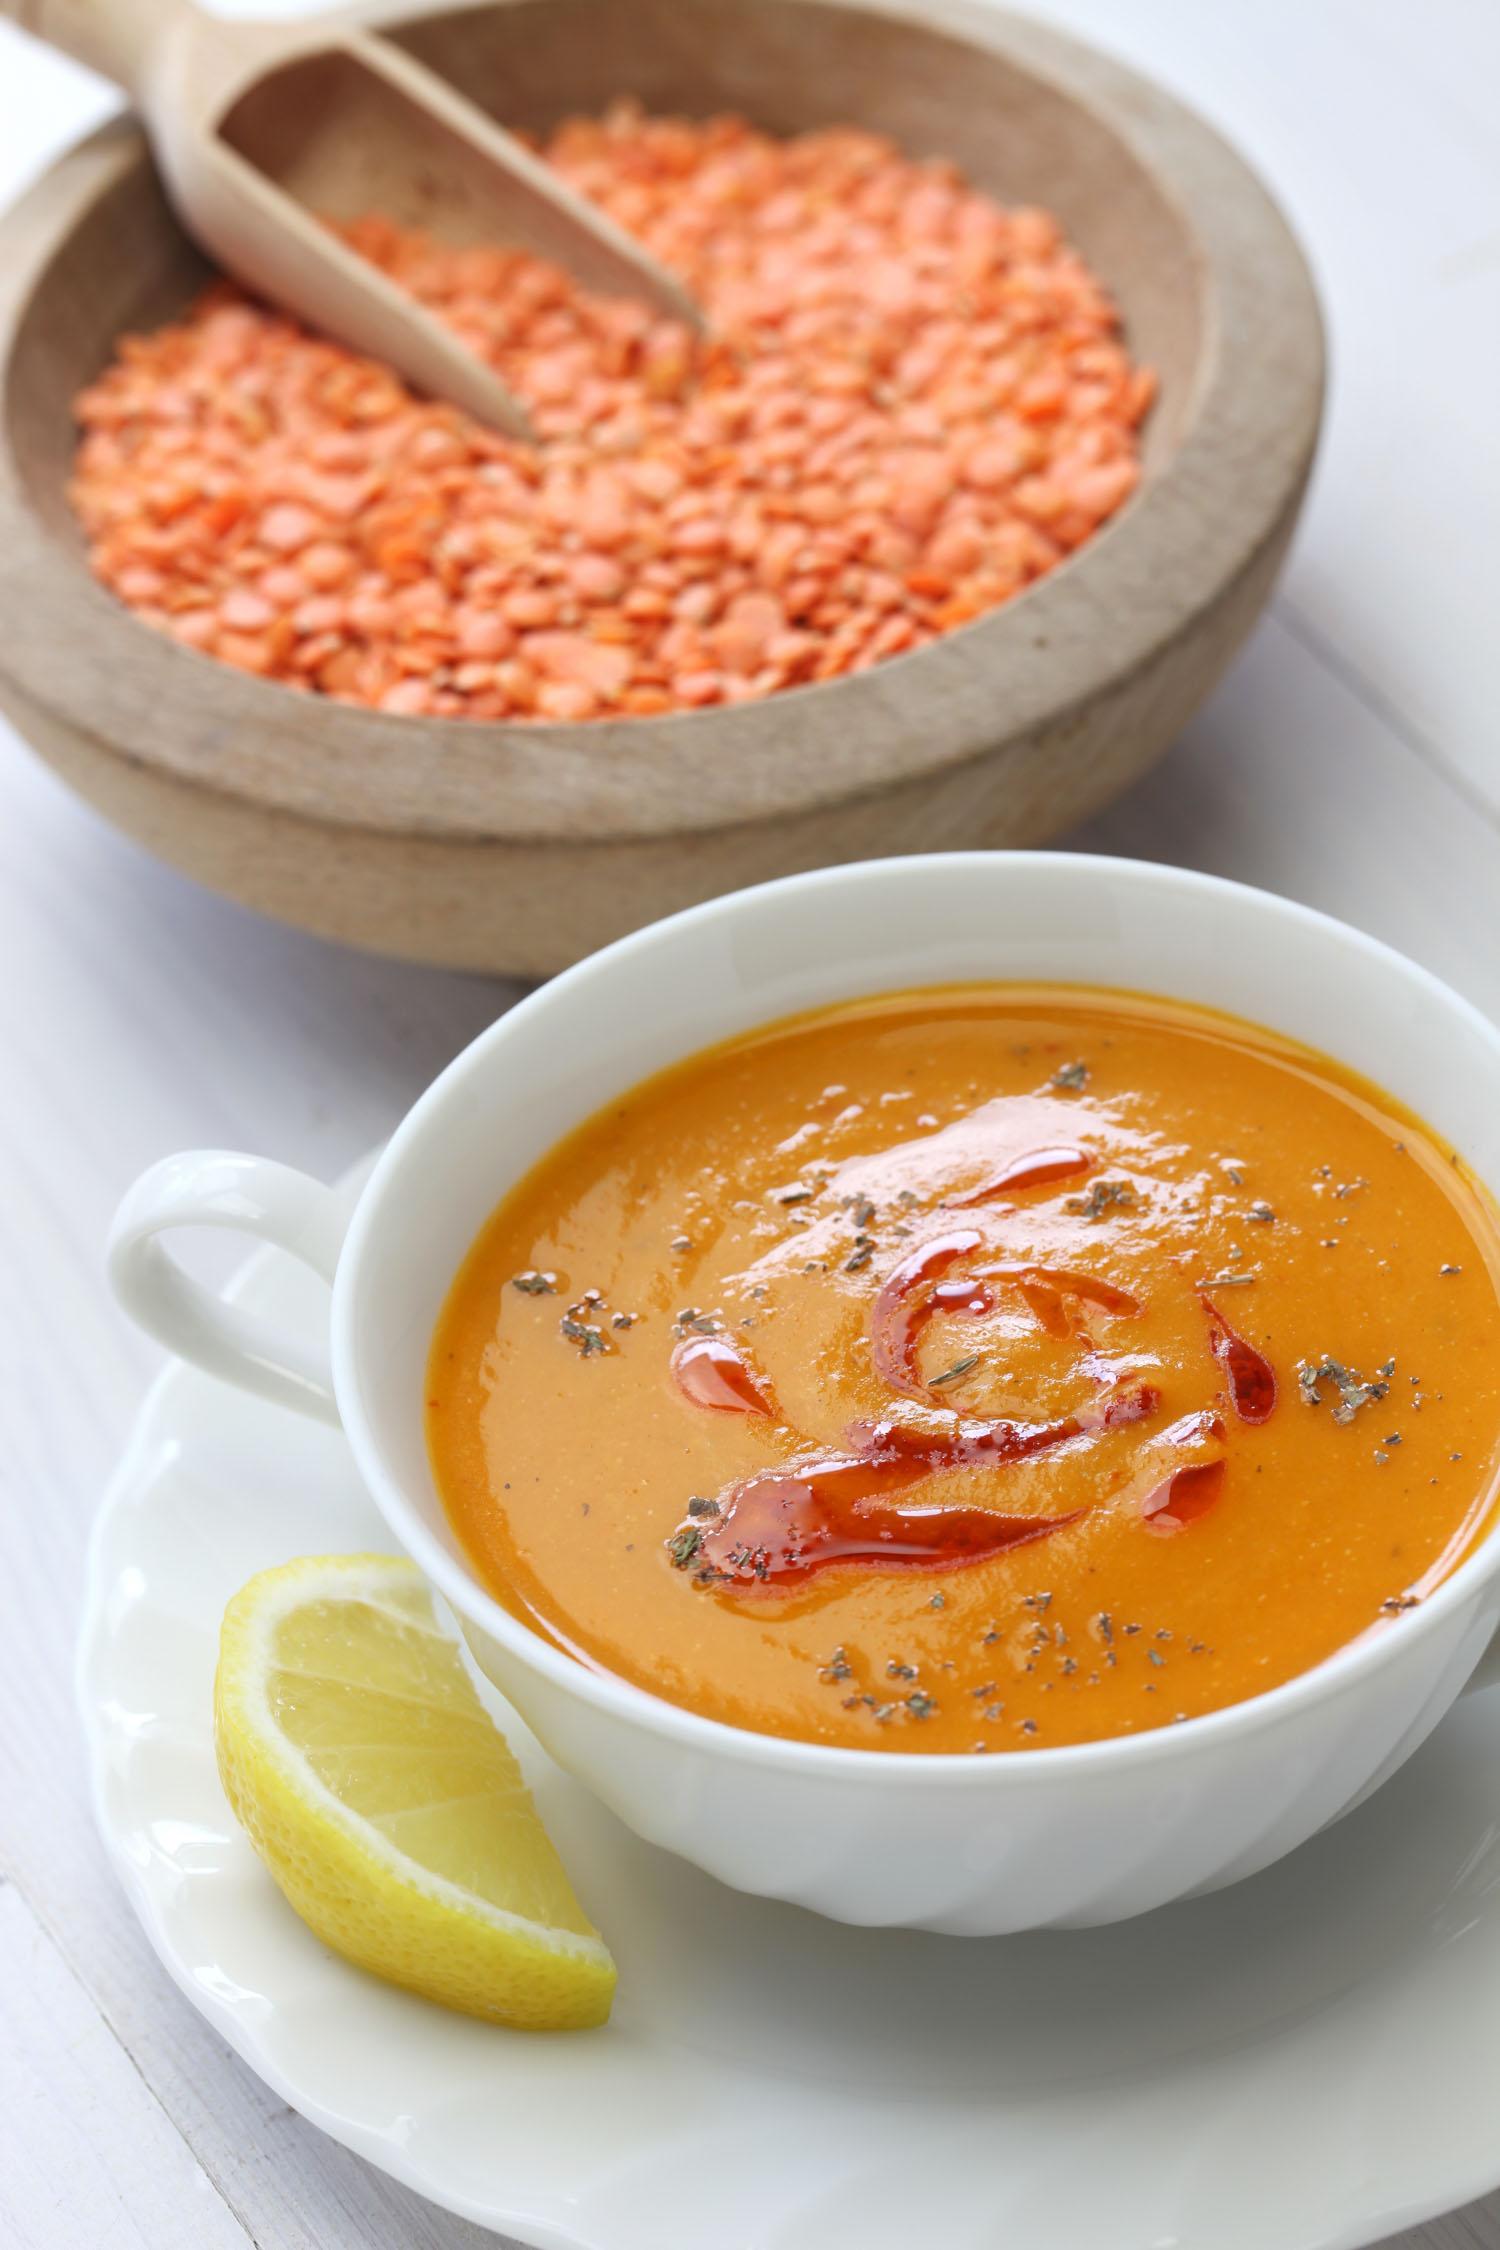 Jordanian red lentil soup also known as mercimek corbasi, red lentil soup, turkish cuisine